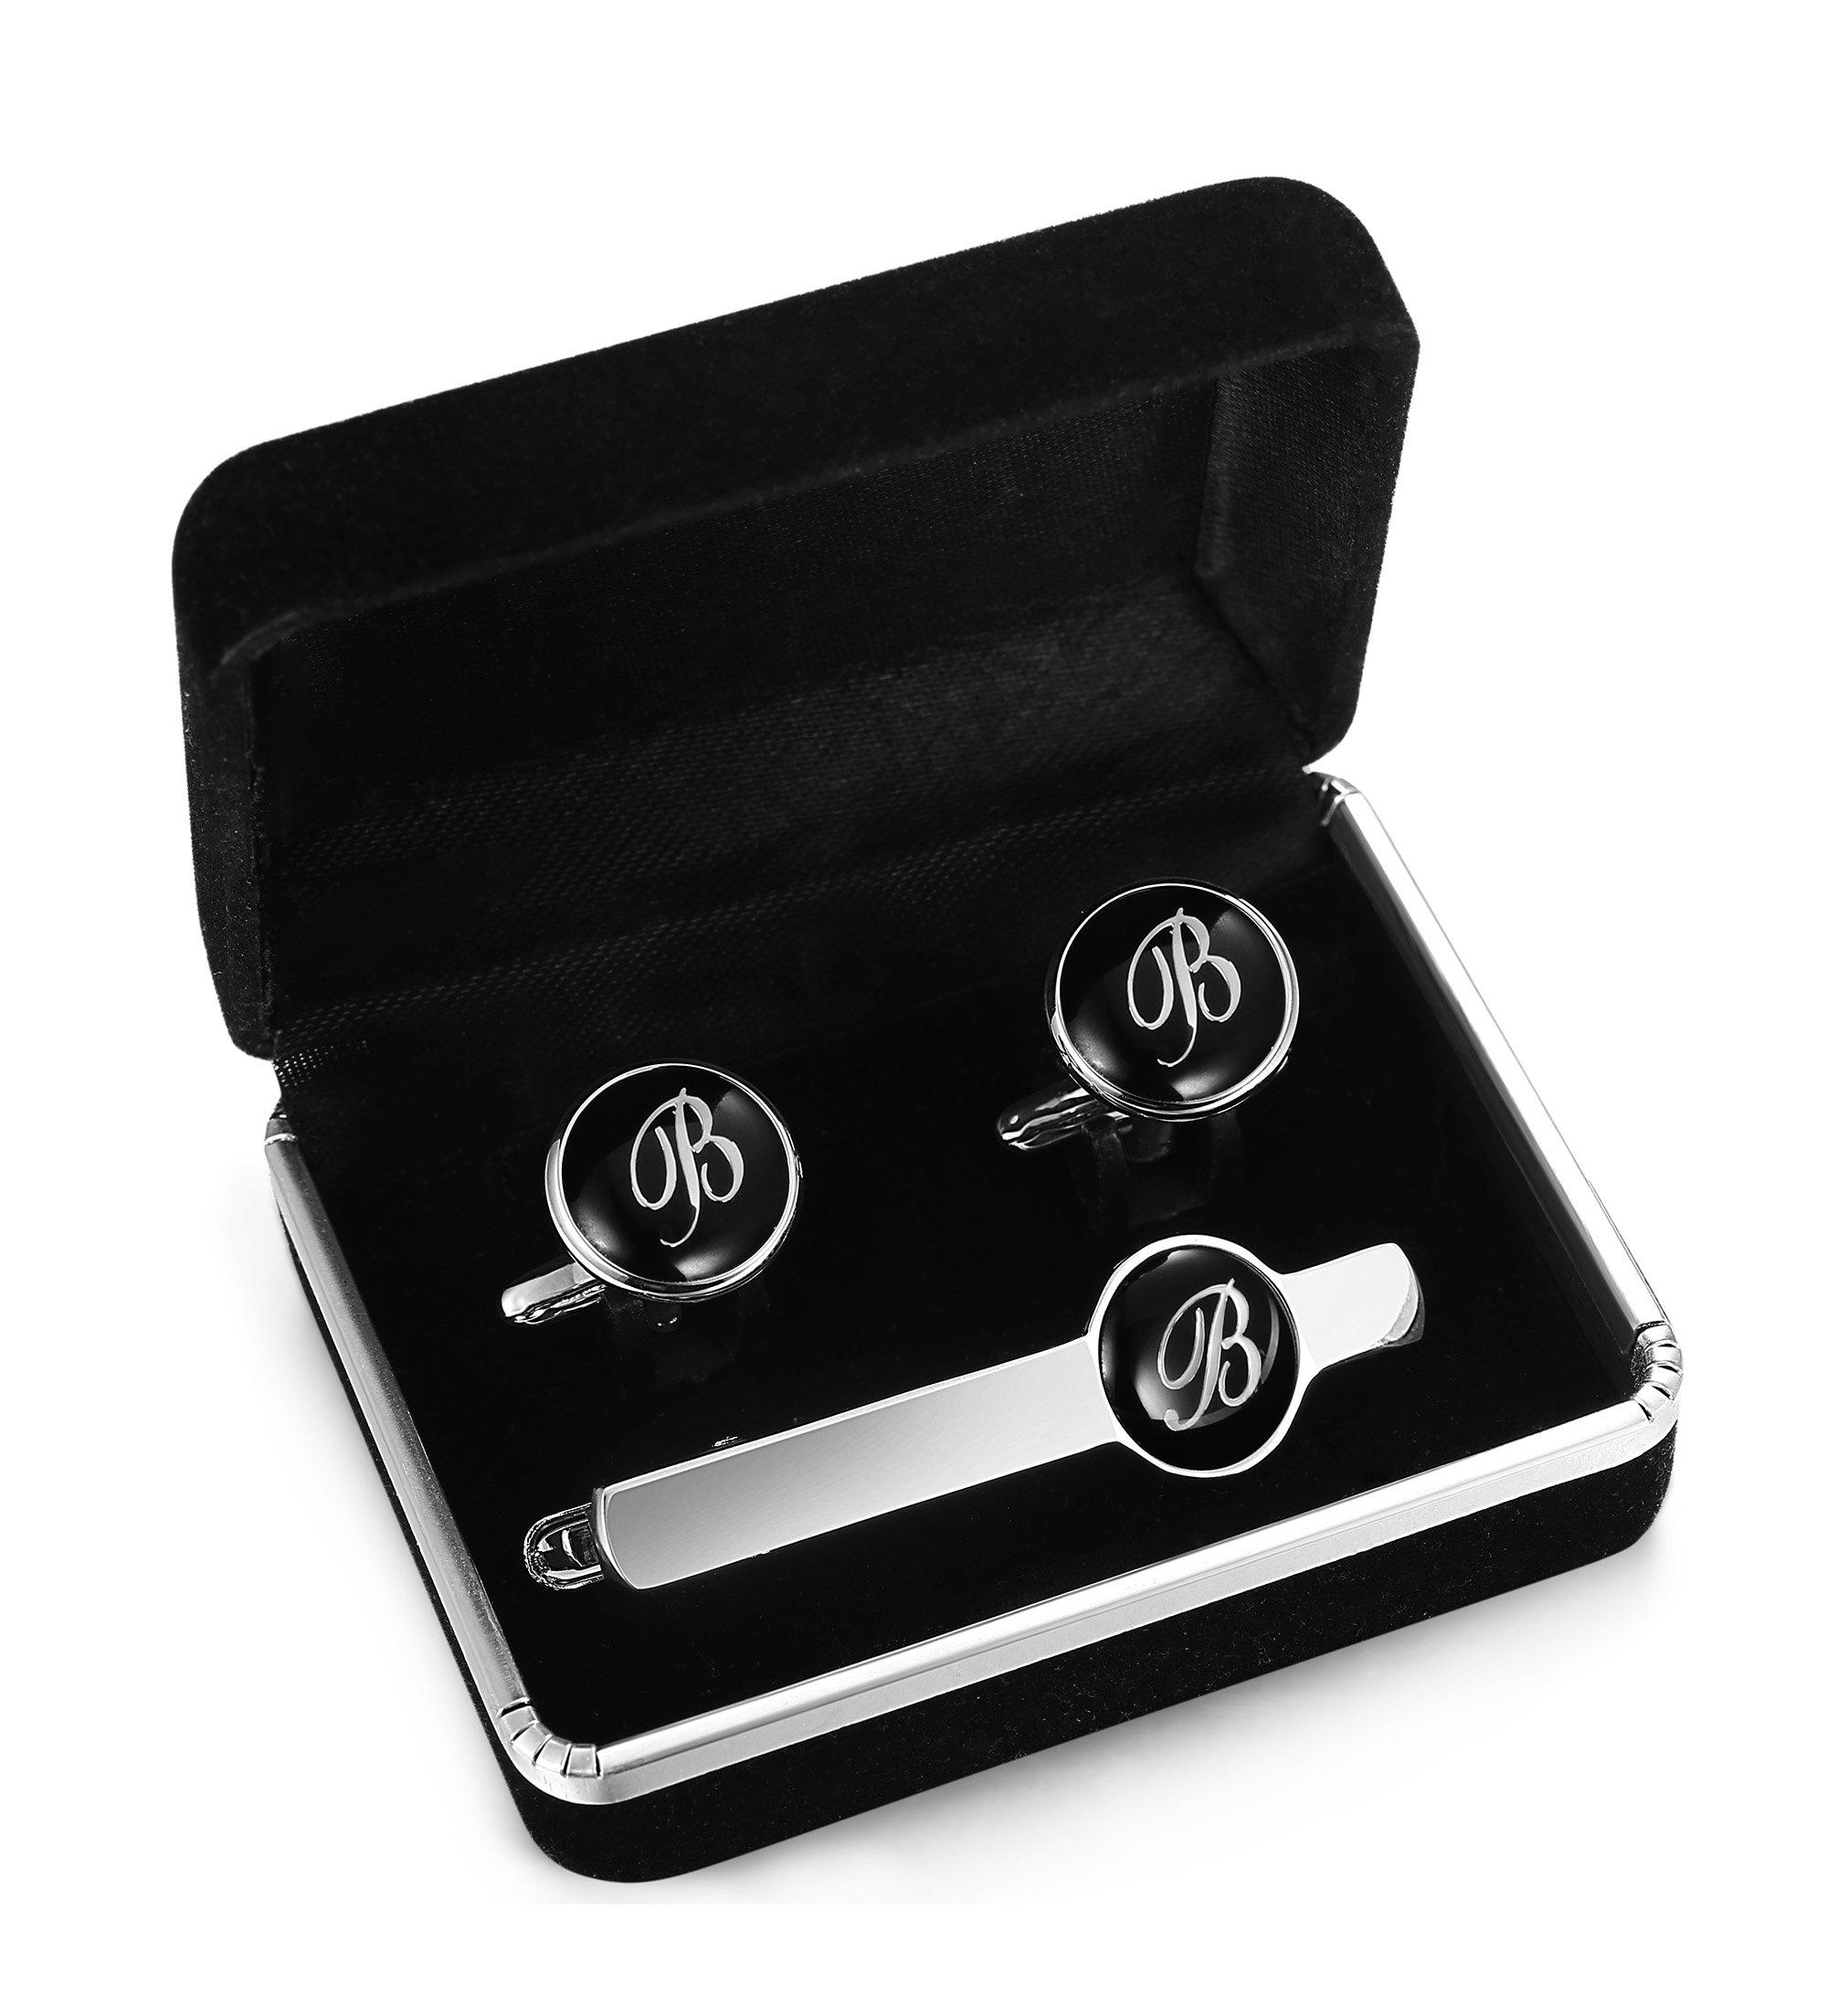 Jstyle Tie Clip and Cufflink Set For Mens Tie Bar Clips Cufflinks Shirt Wedding Business With Gift Box,Alphabet A-Z (Alphabet B)